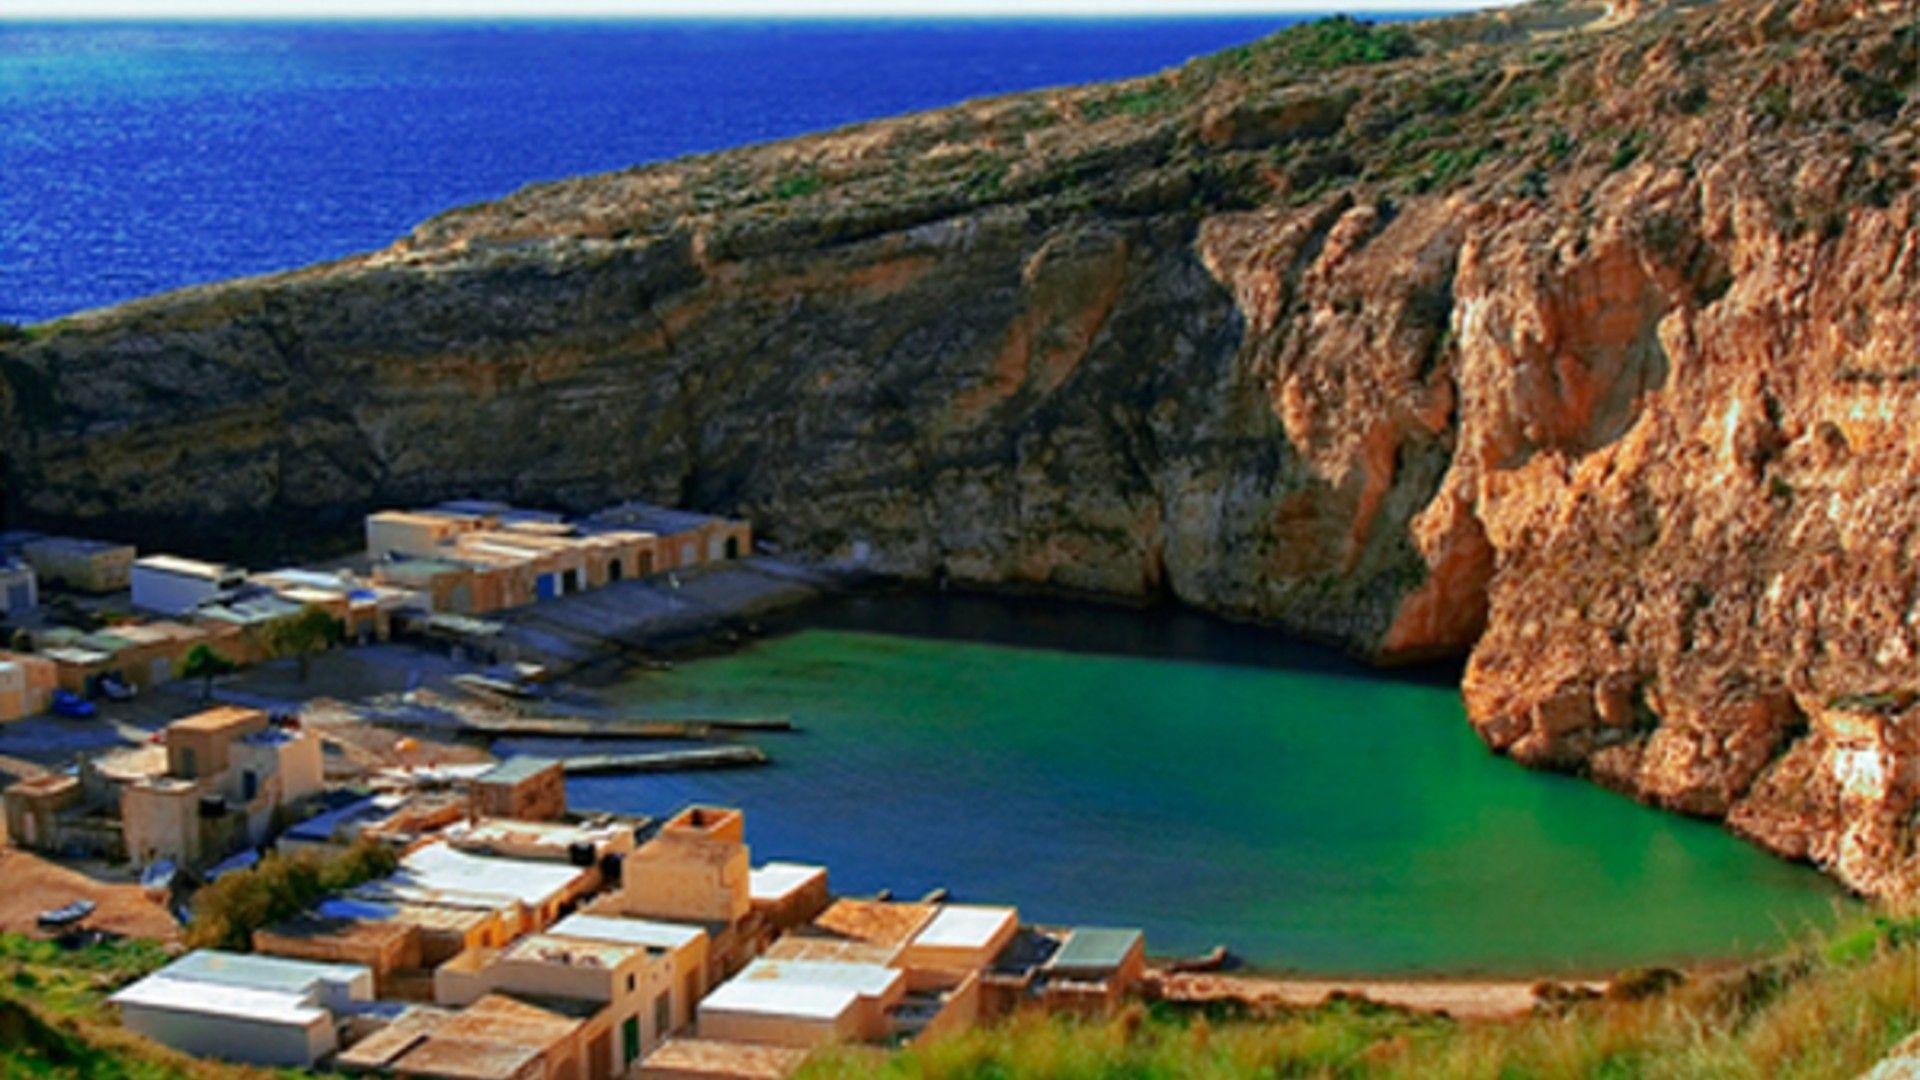 Обои Мальта, malta xlokk, malta, Залив, Marsaxlok, marsaxlokk bay, марсашлокк. Города foto 14